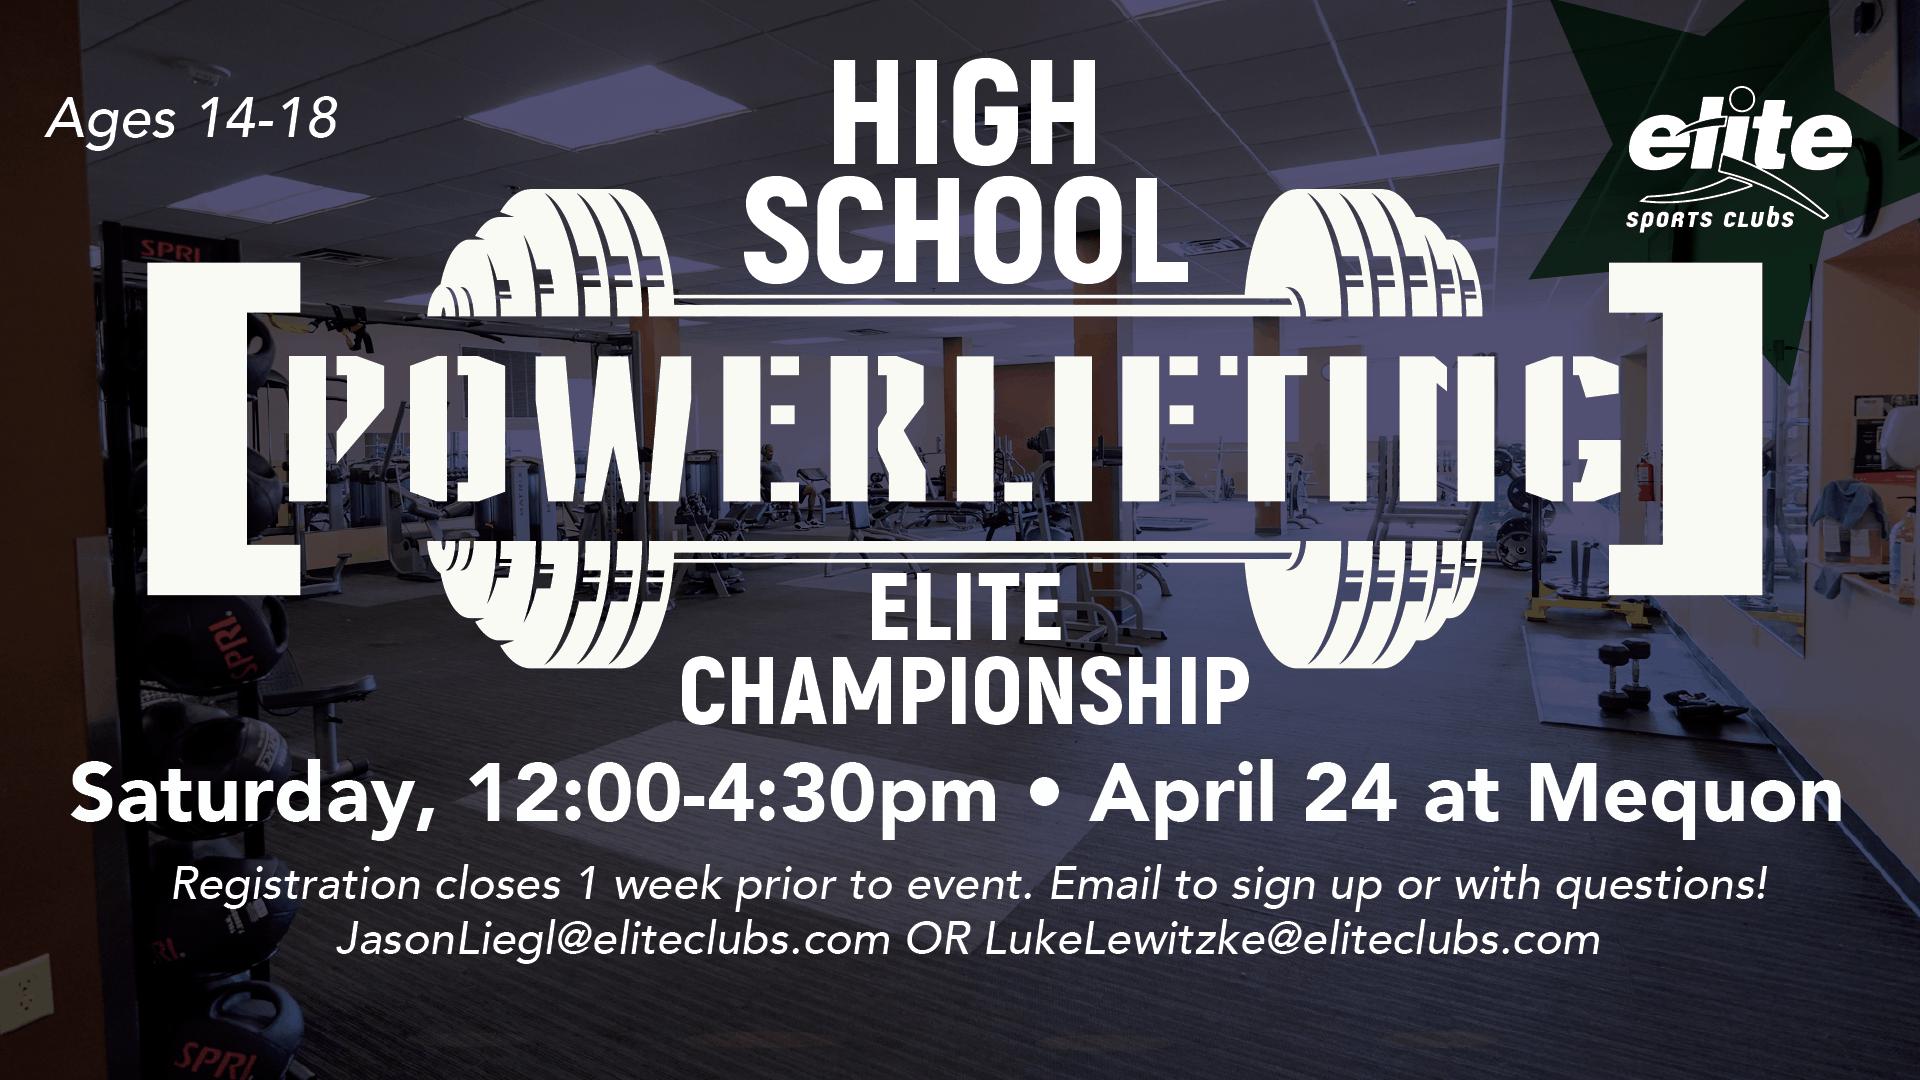 High School Powerlifting Elite Championship - Elite Mequon - April 2021